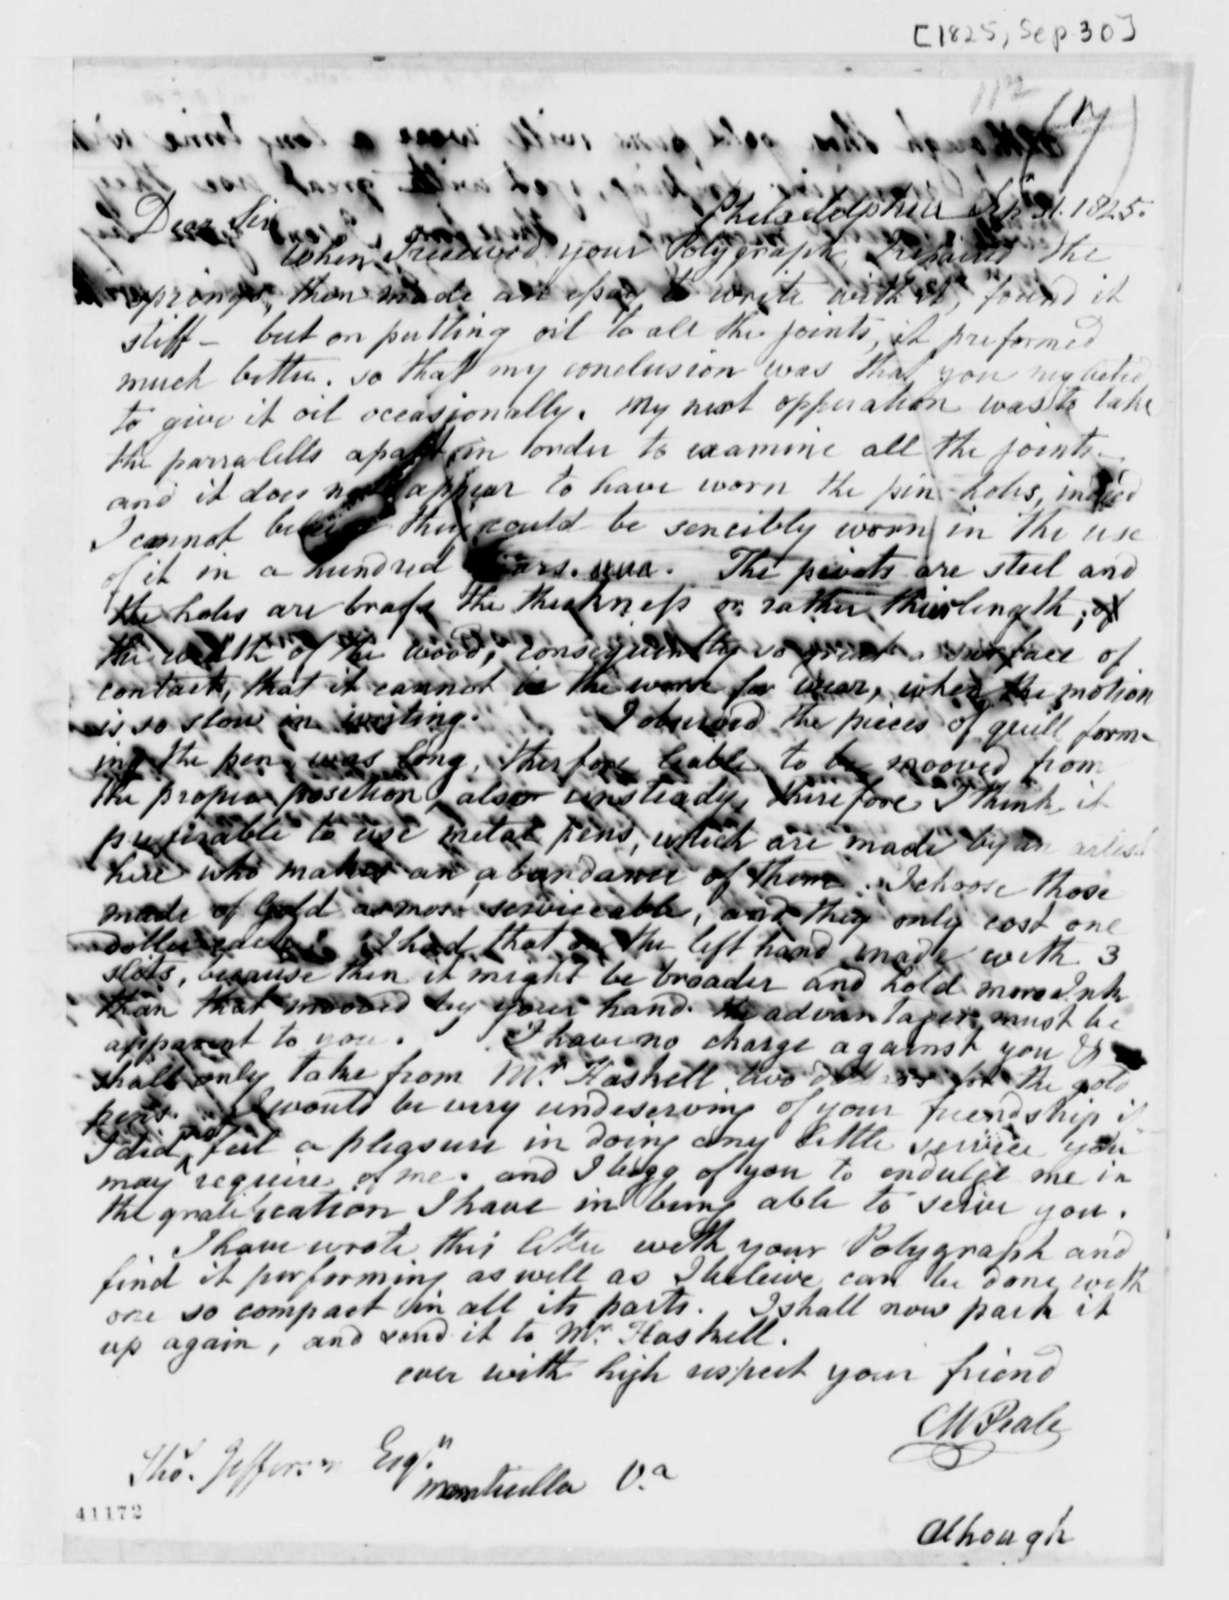 Charles Willson Peale to Thomas Jefferson, September 30, 1825